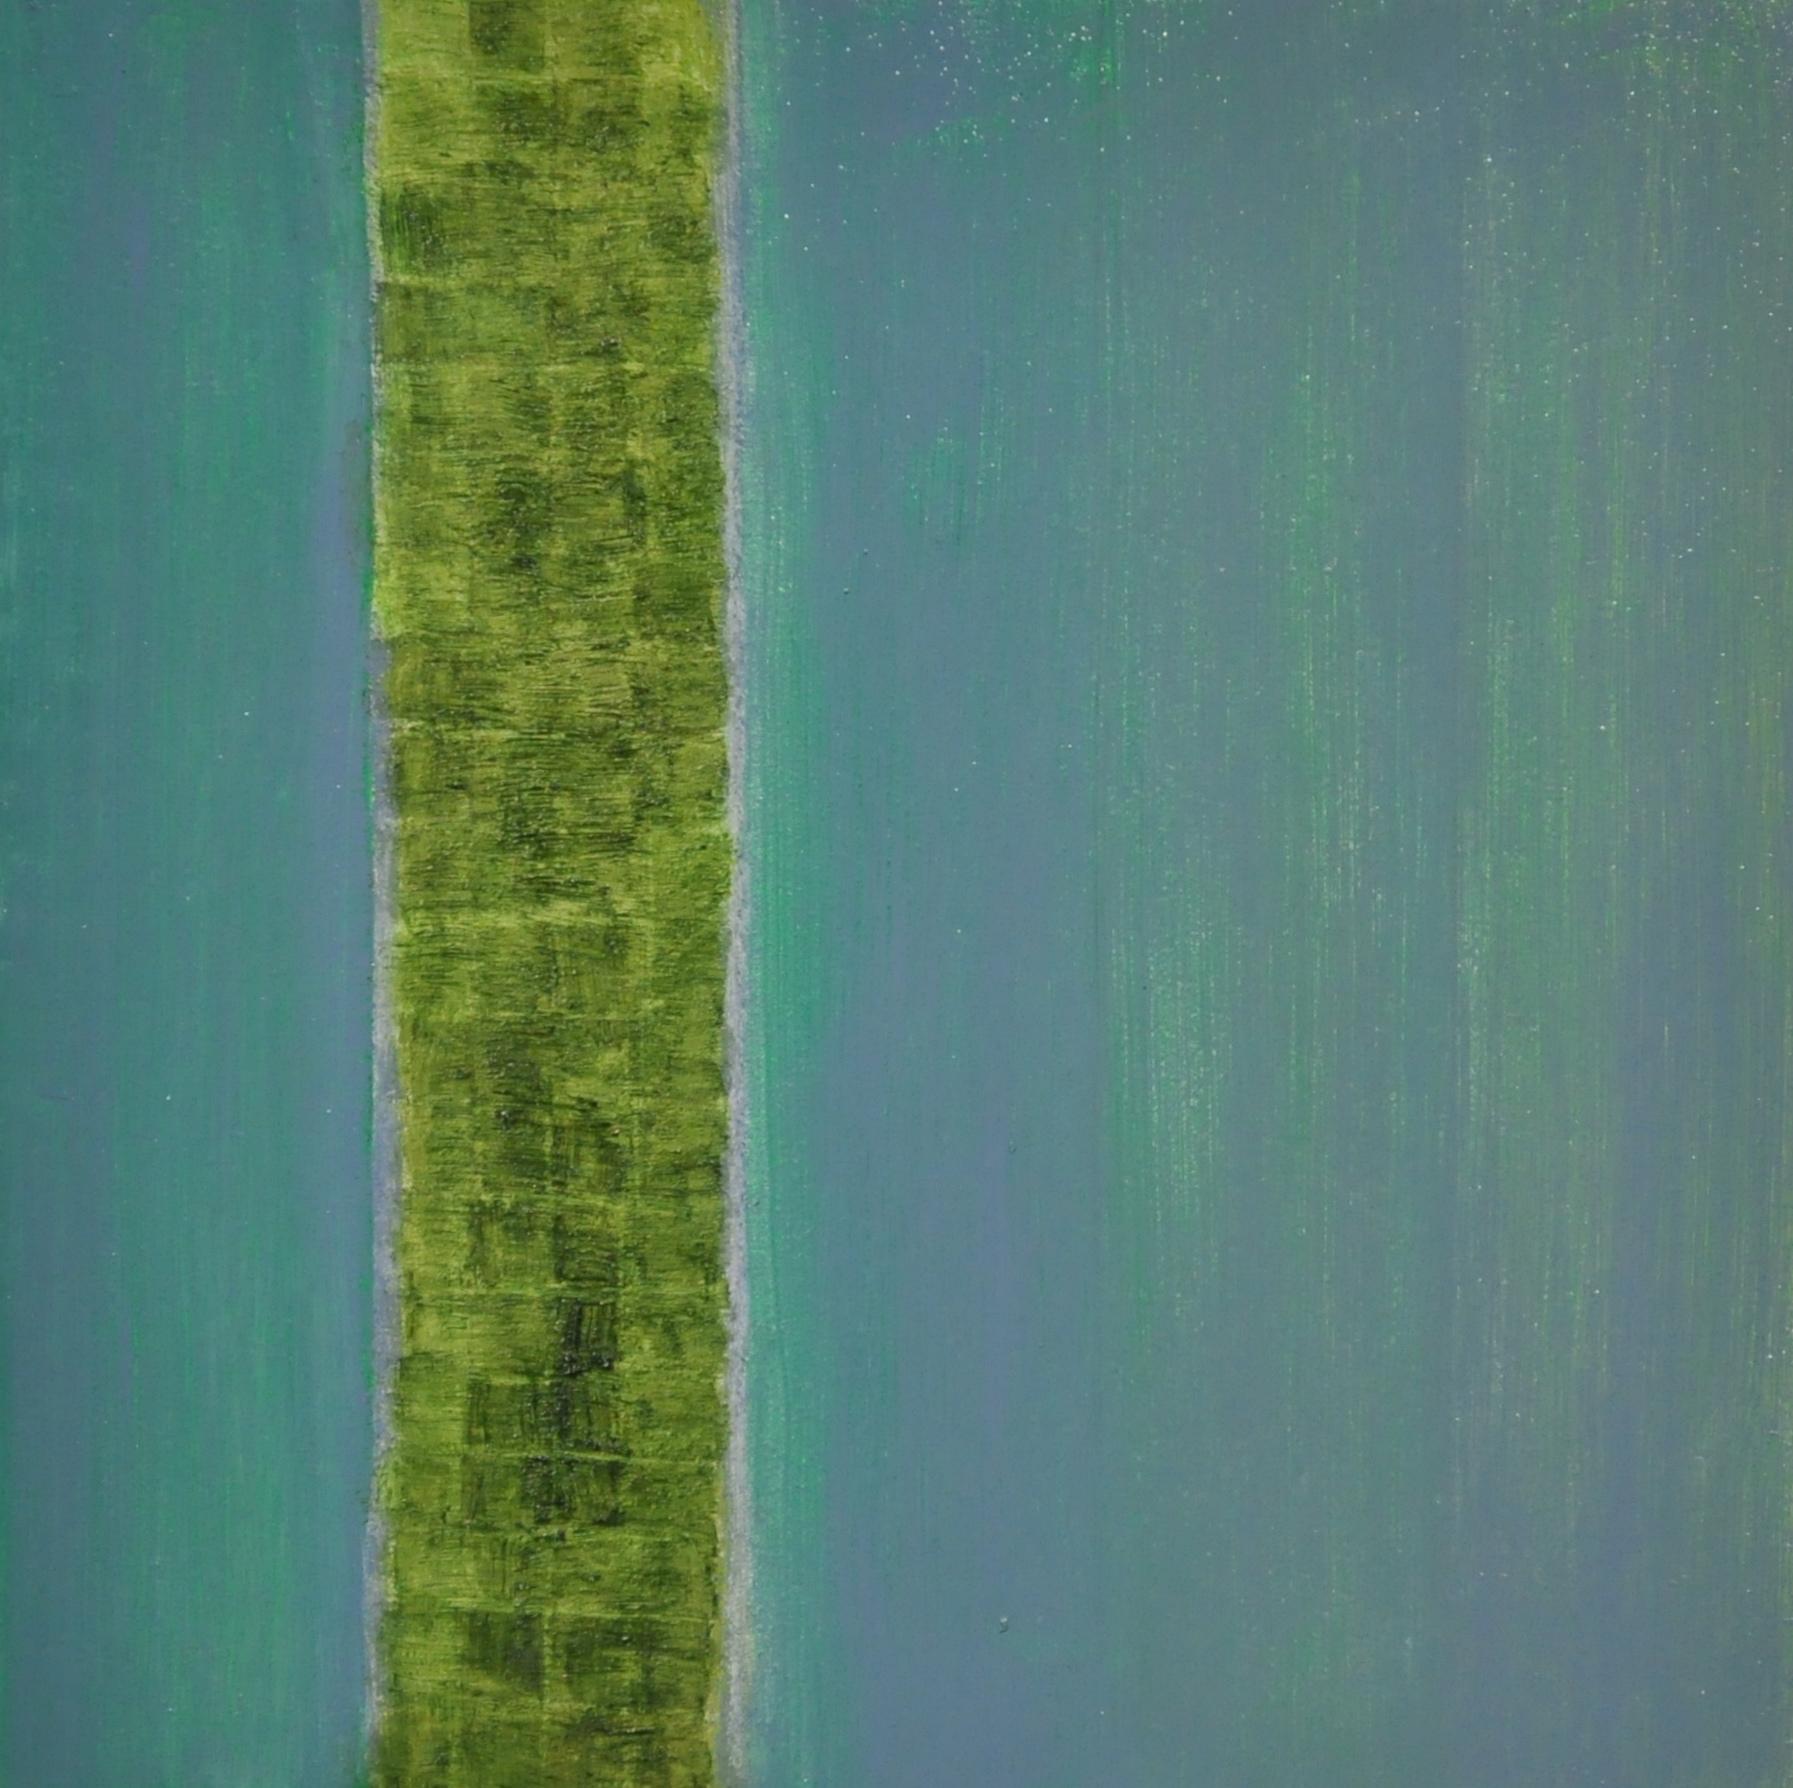 ribbon, 2016 oil on wood panel, 12.5 x 12.5 cm